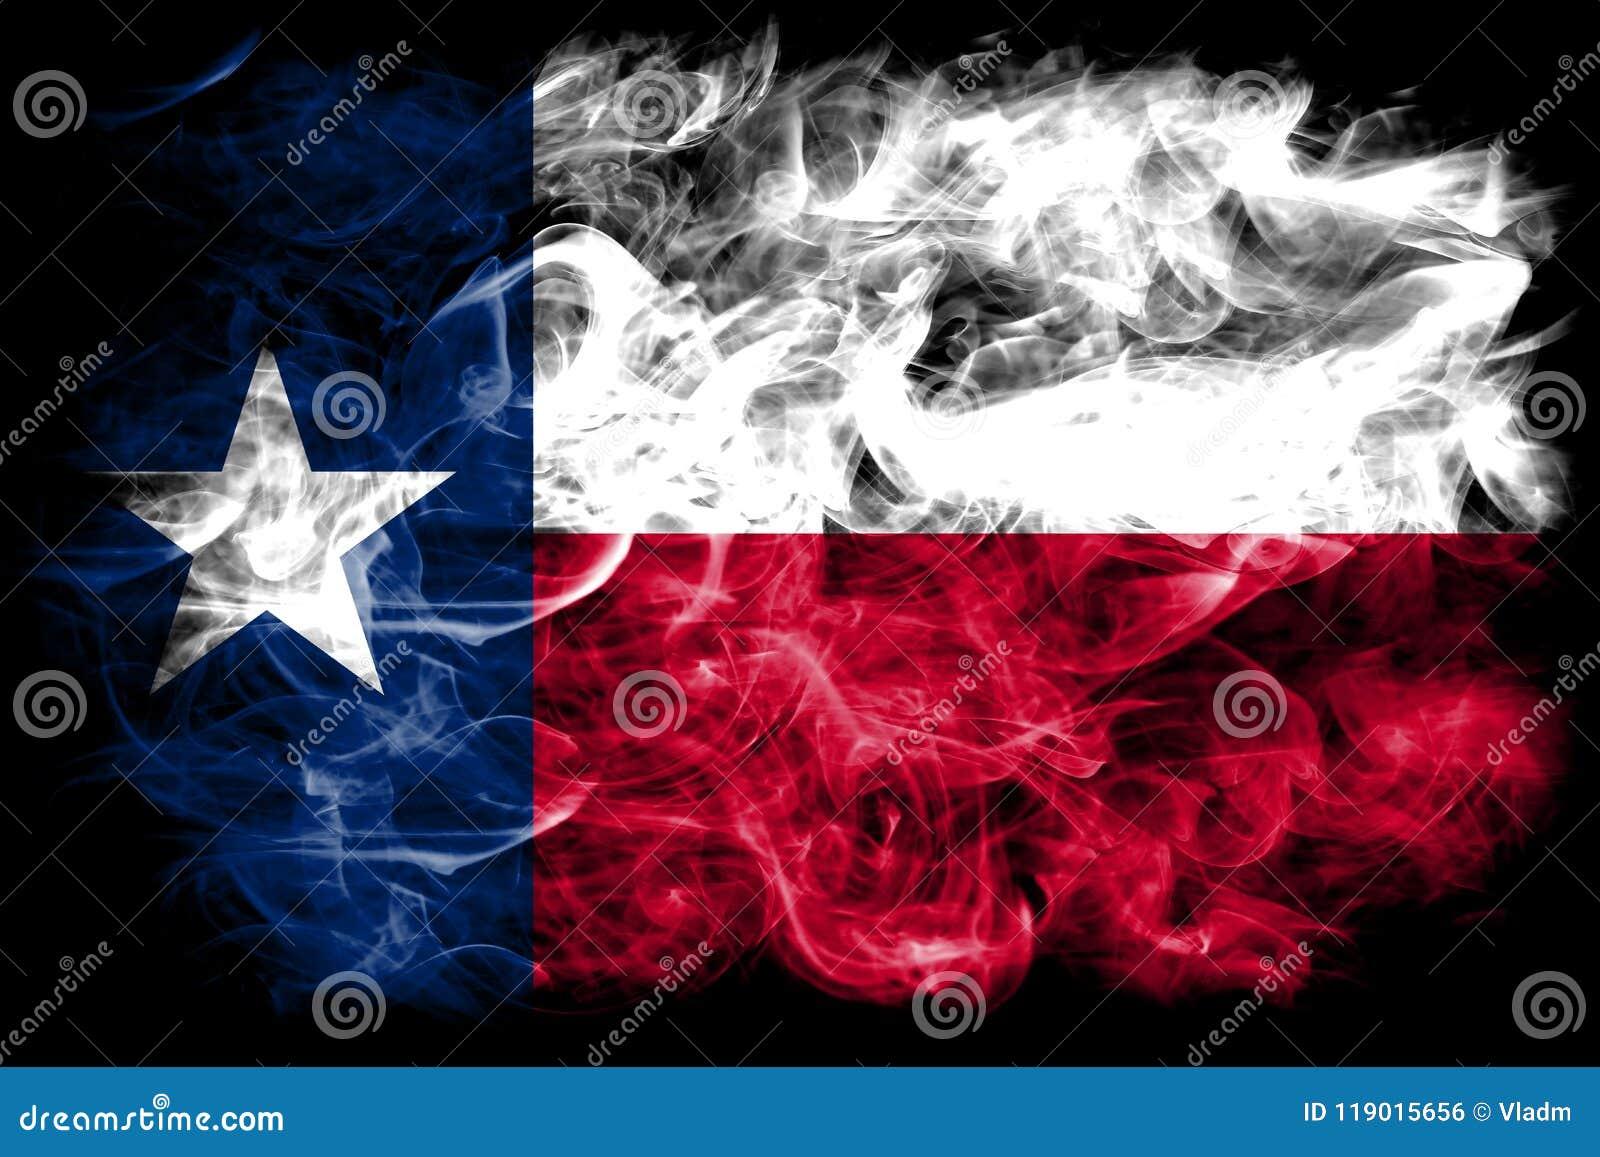 Texas state smoke flag, United States Of America